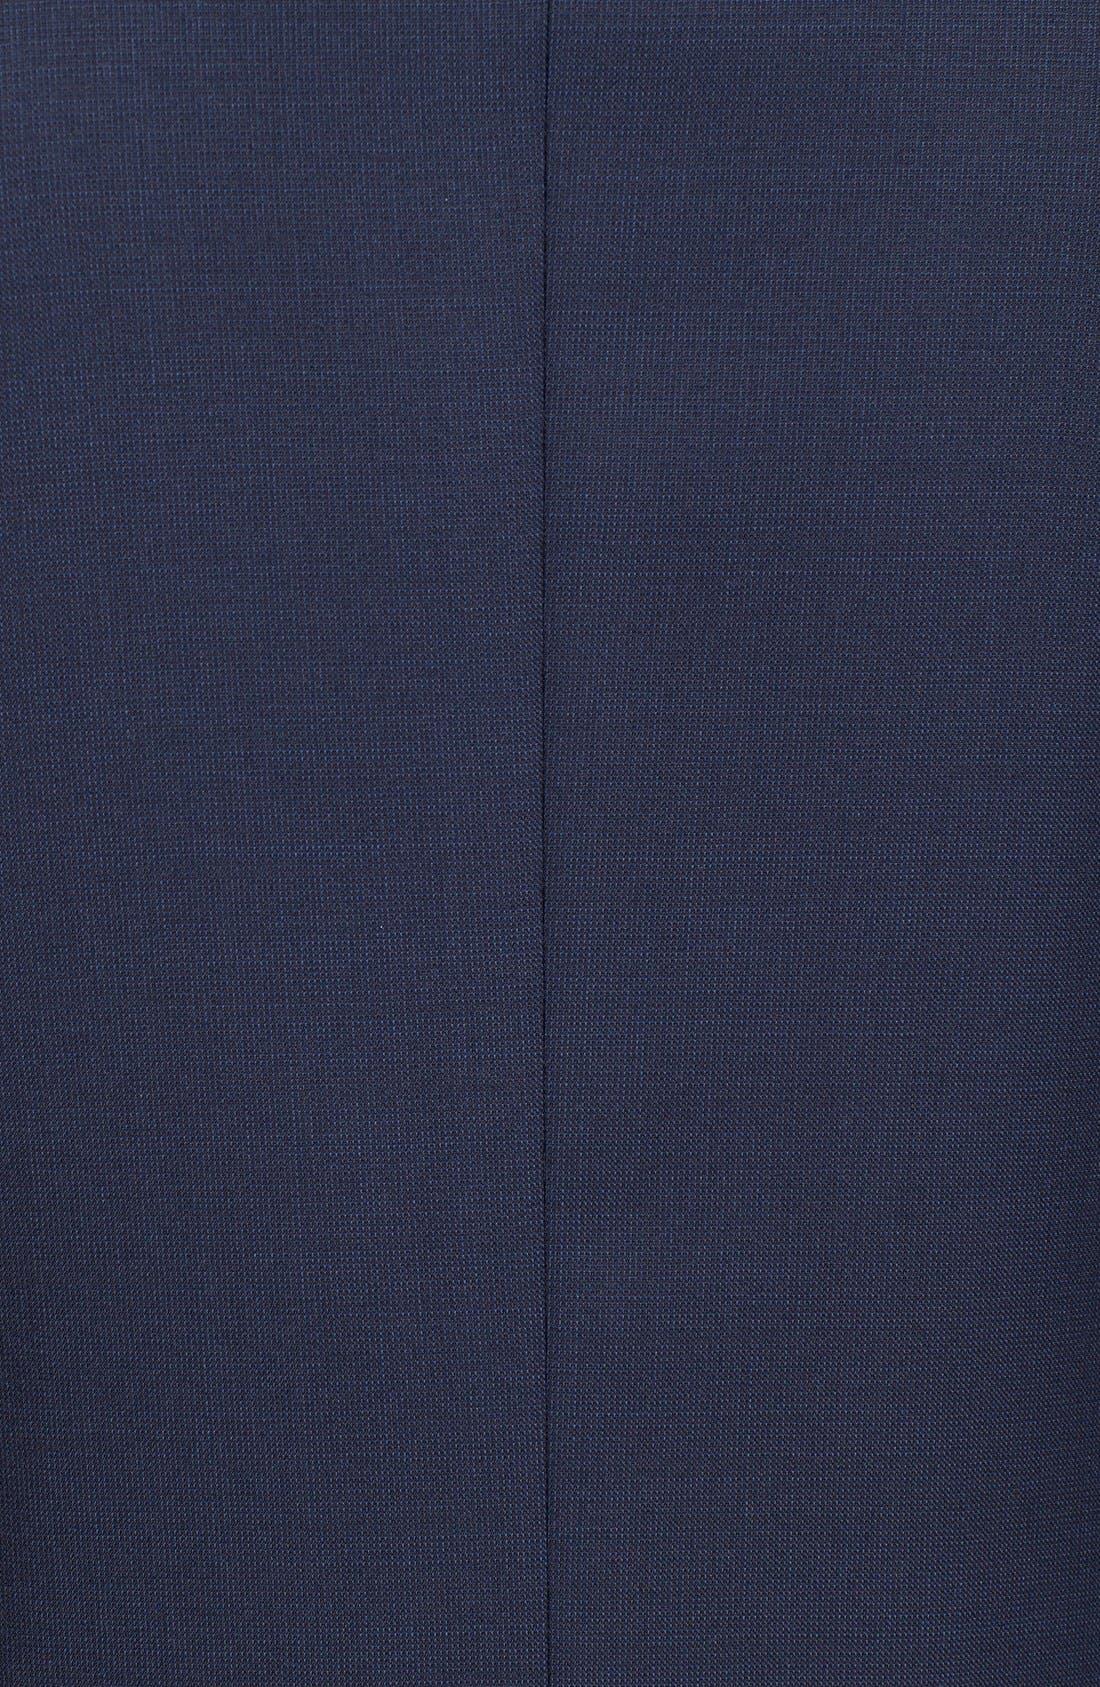 TED BAKER LONDON, Trevi Slim Fit Wool Blazer, Alternate thumbnail 11, color, NAVY